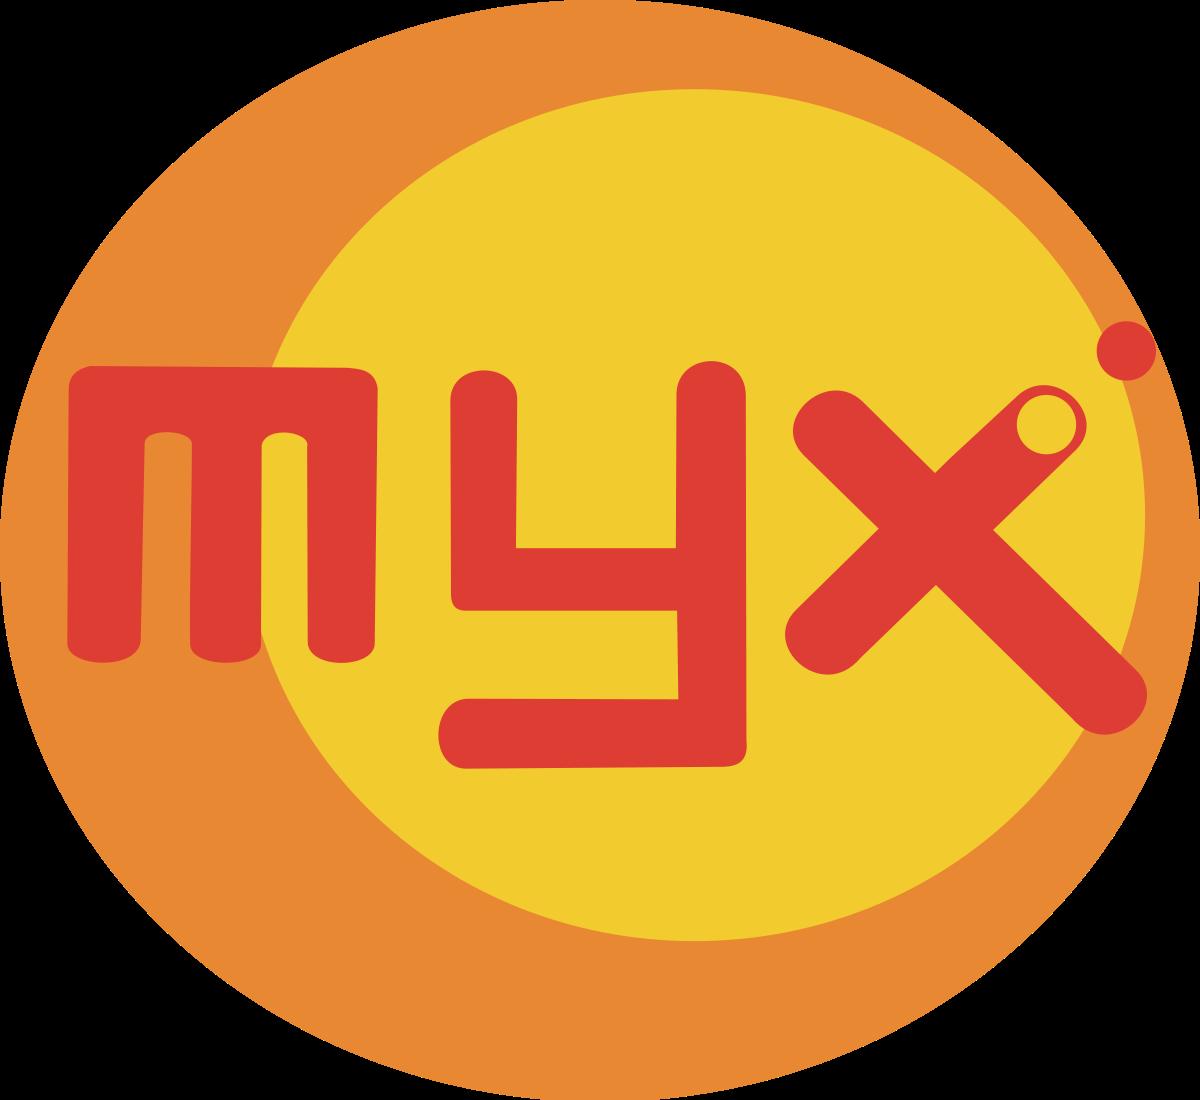 myxlogo.png